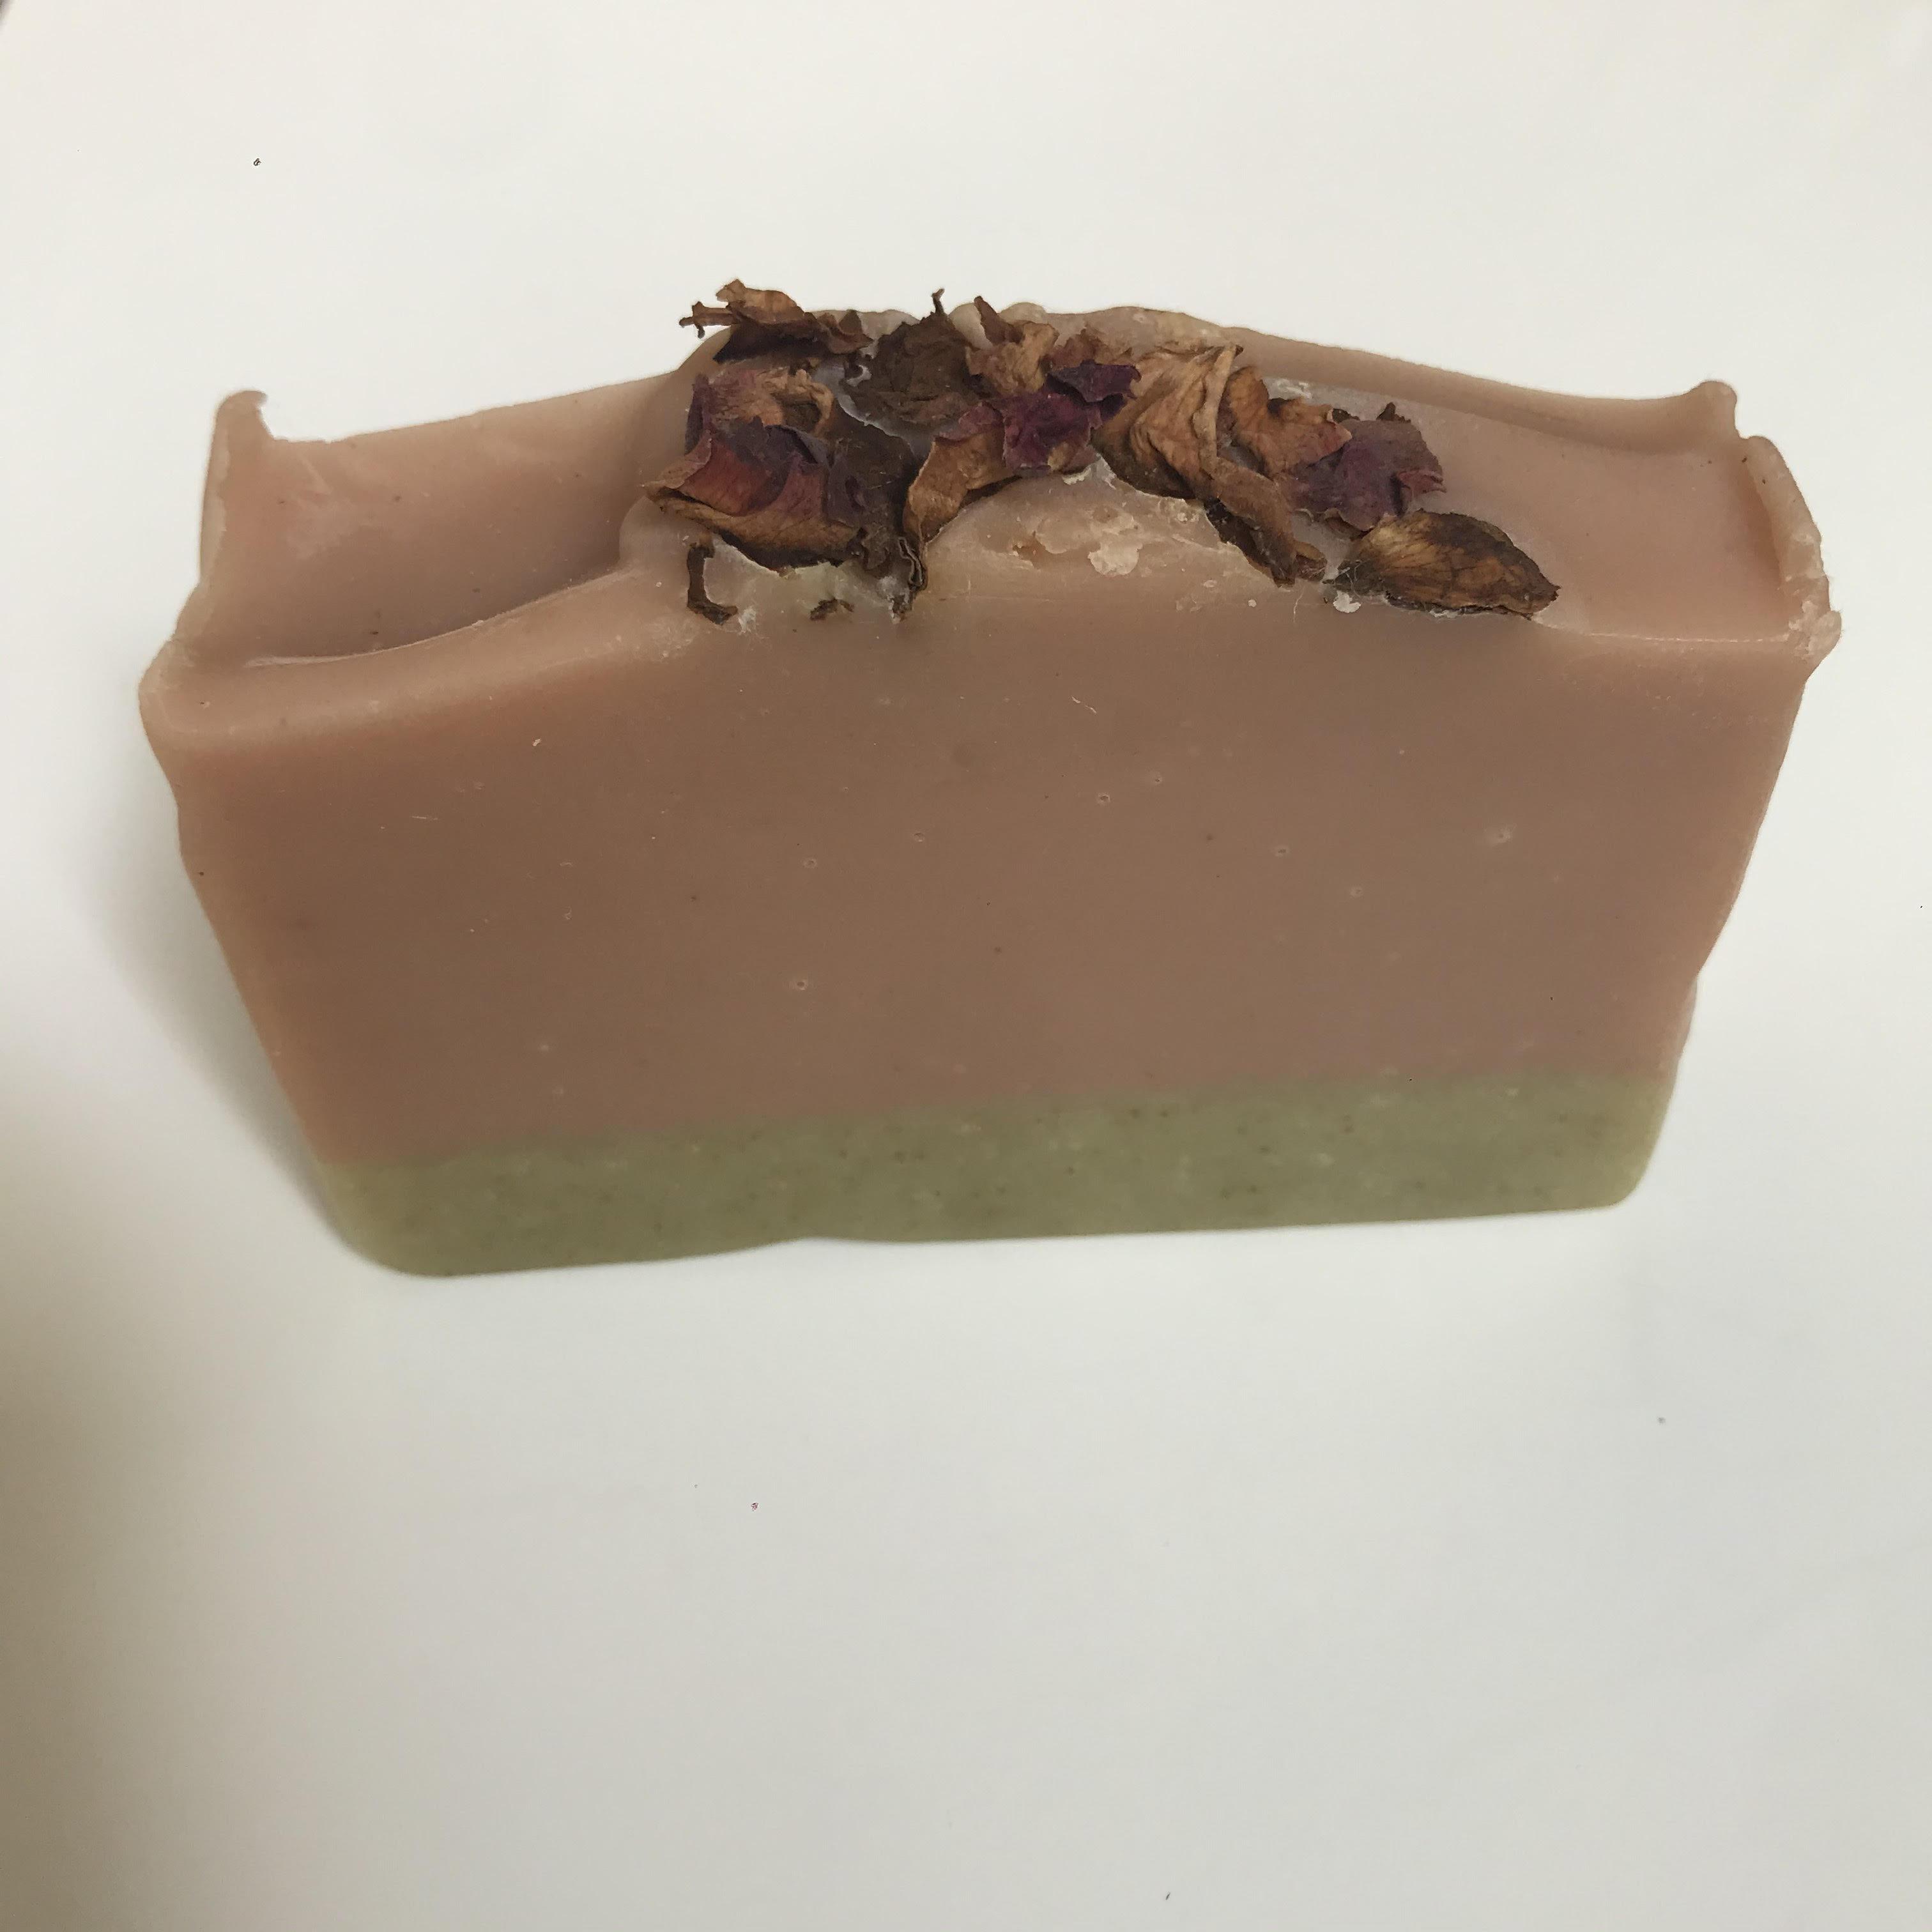 Gypsy Rose Soap